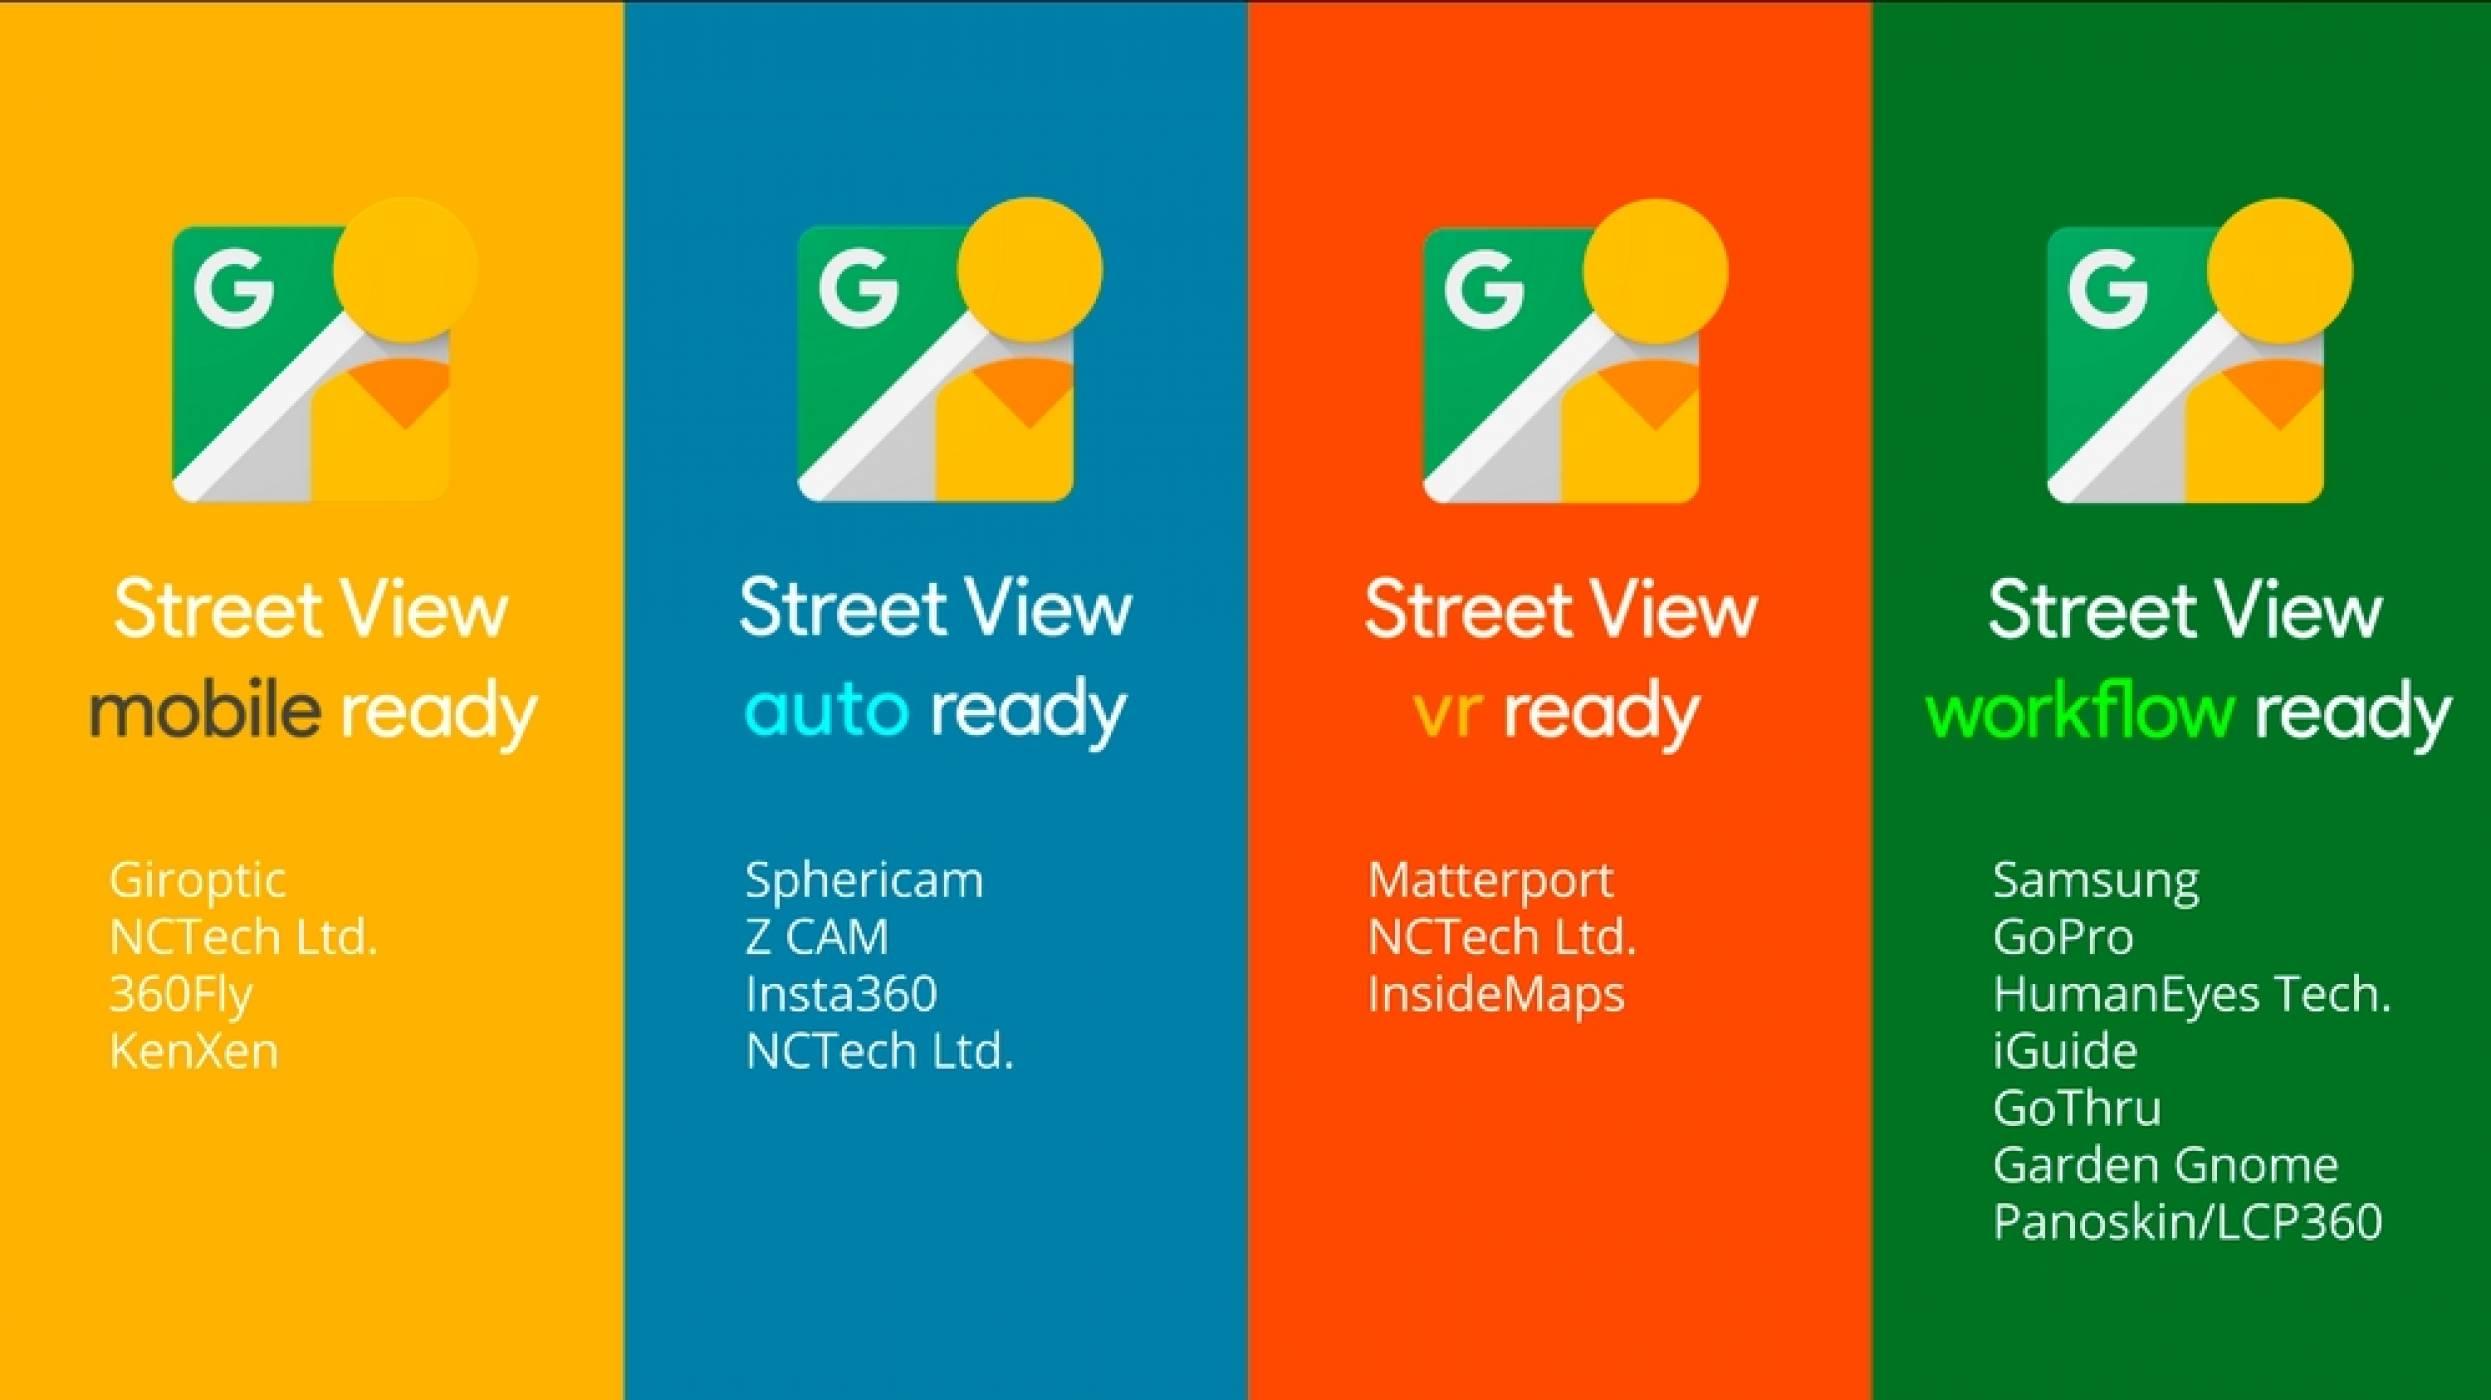 Google Street View Ready e нов стандарт за качество за 360-градусови изображения